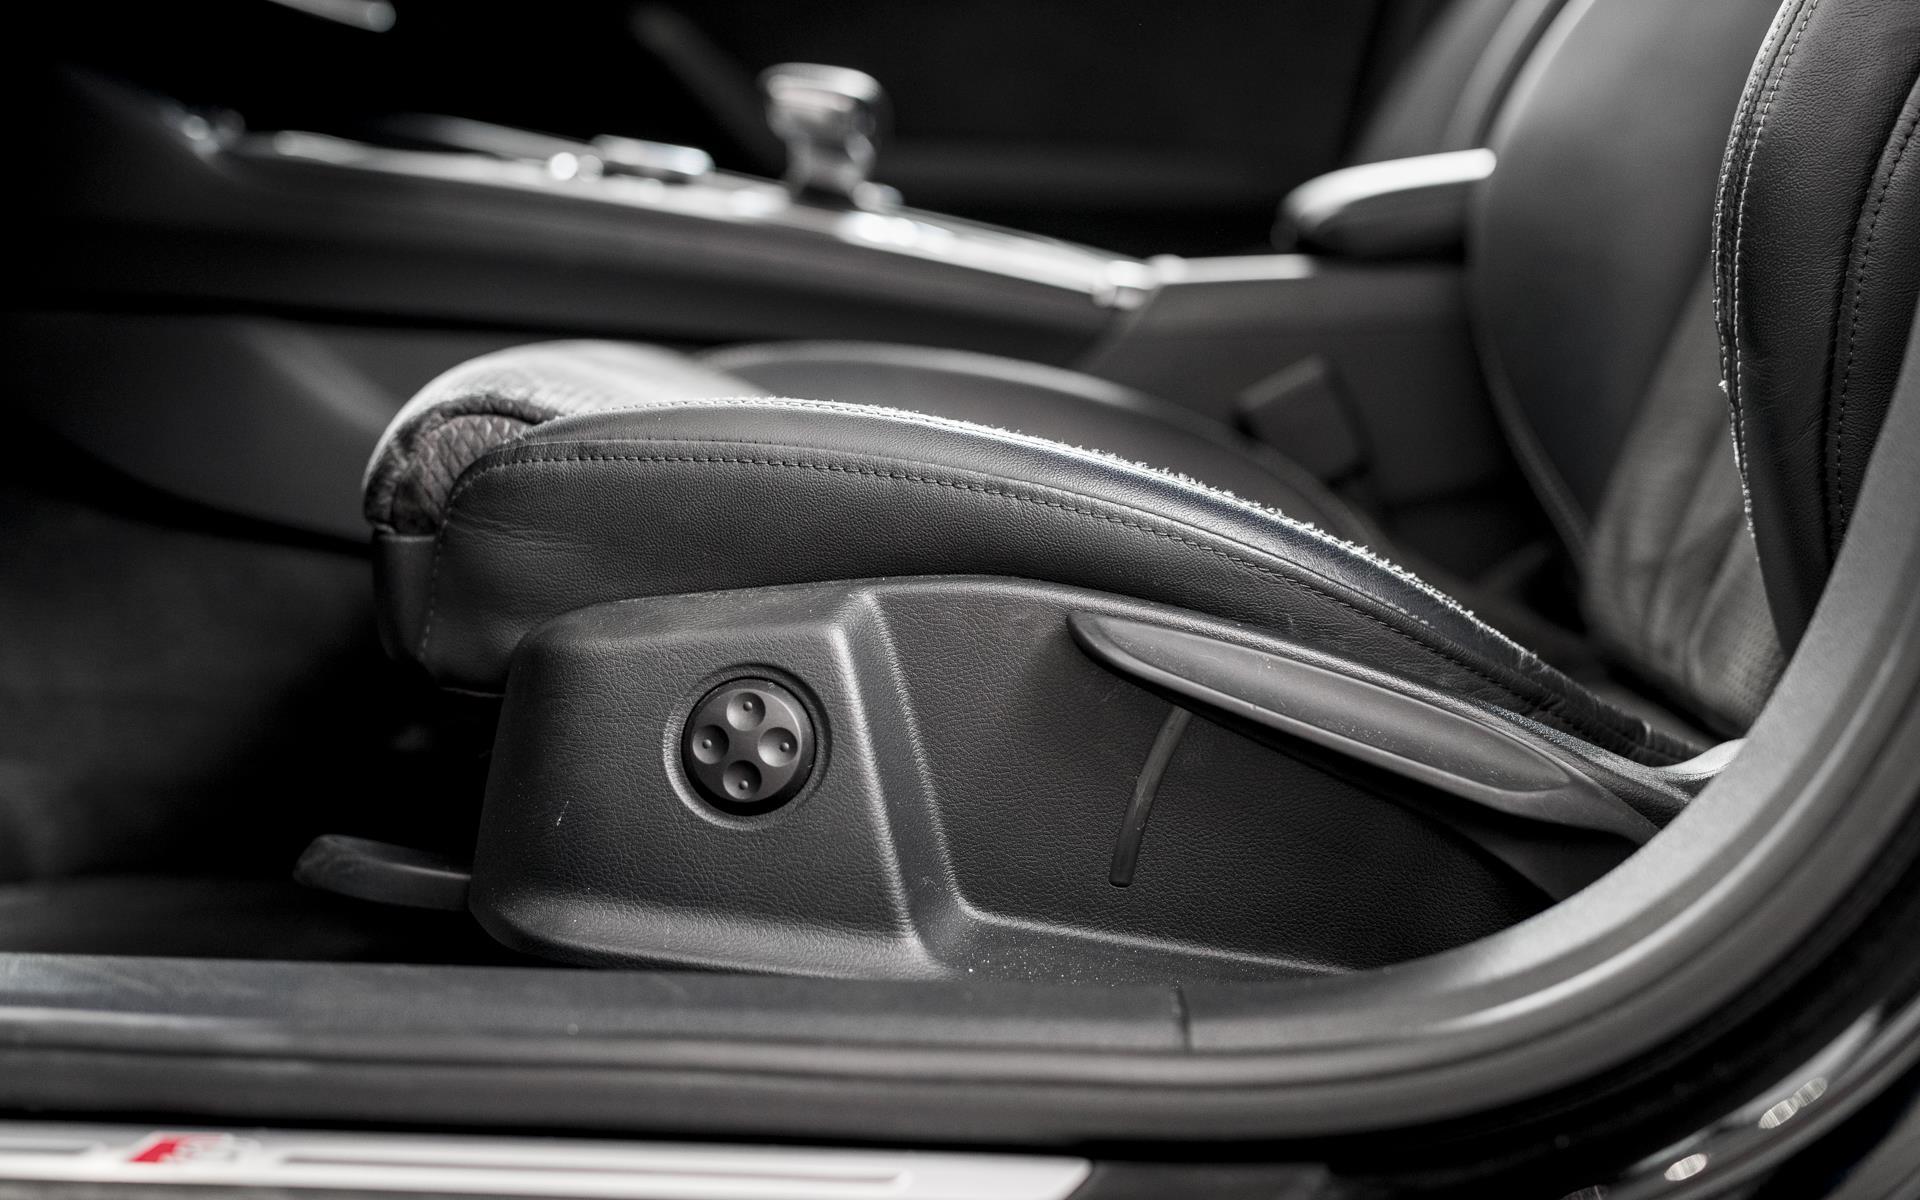 Avant 2,0 TDI S-Line Black Edition TipTronic 190HK Stc  image10